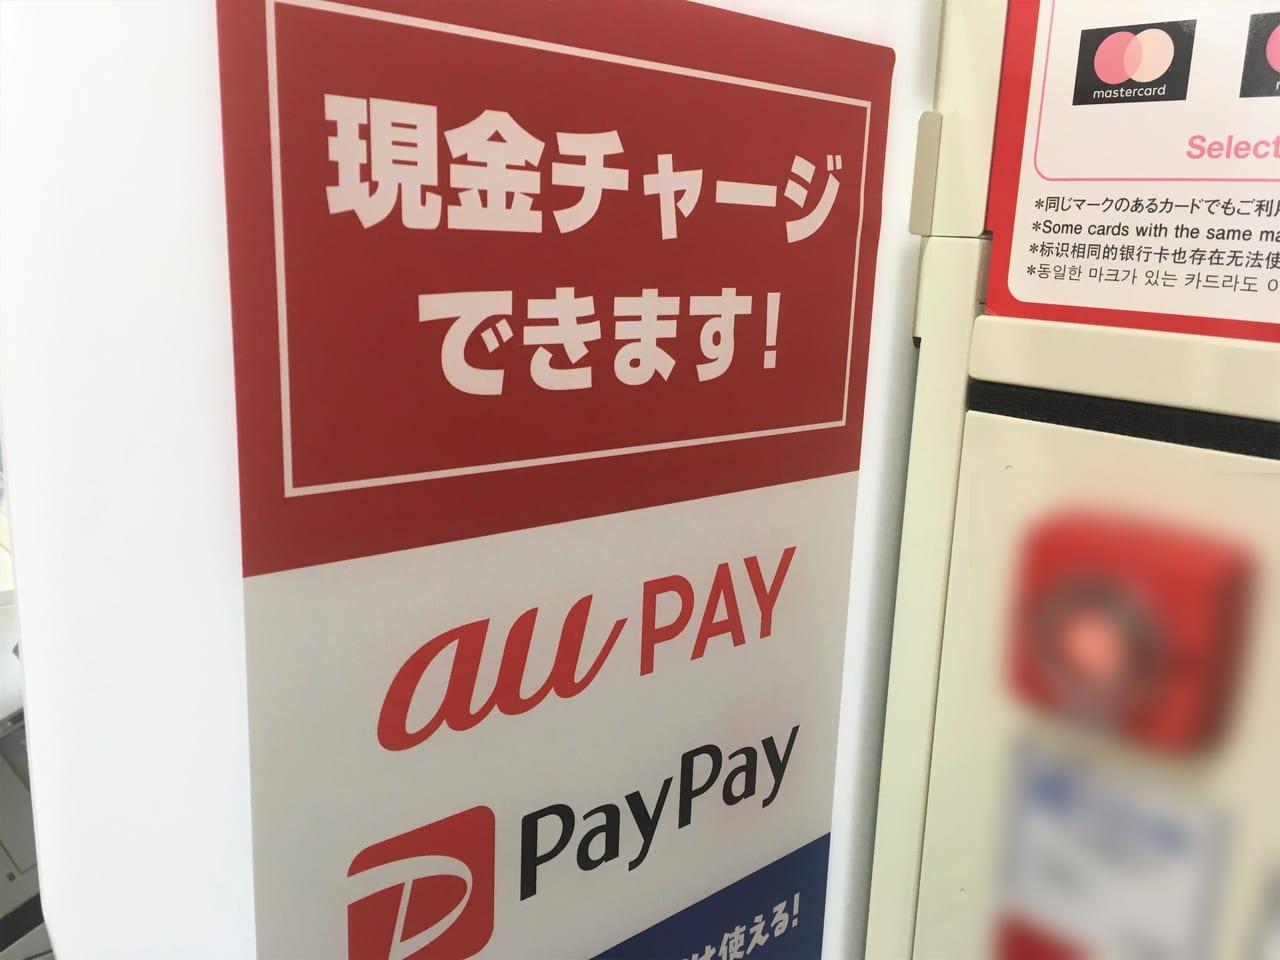 auPay PayPay現金チャージATM